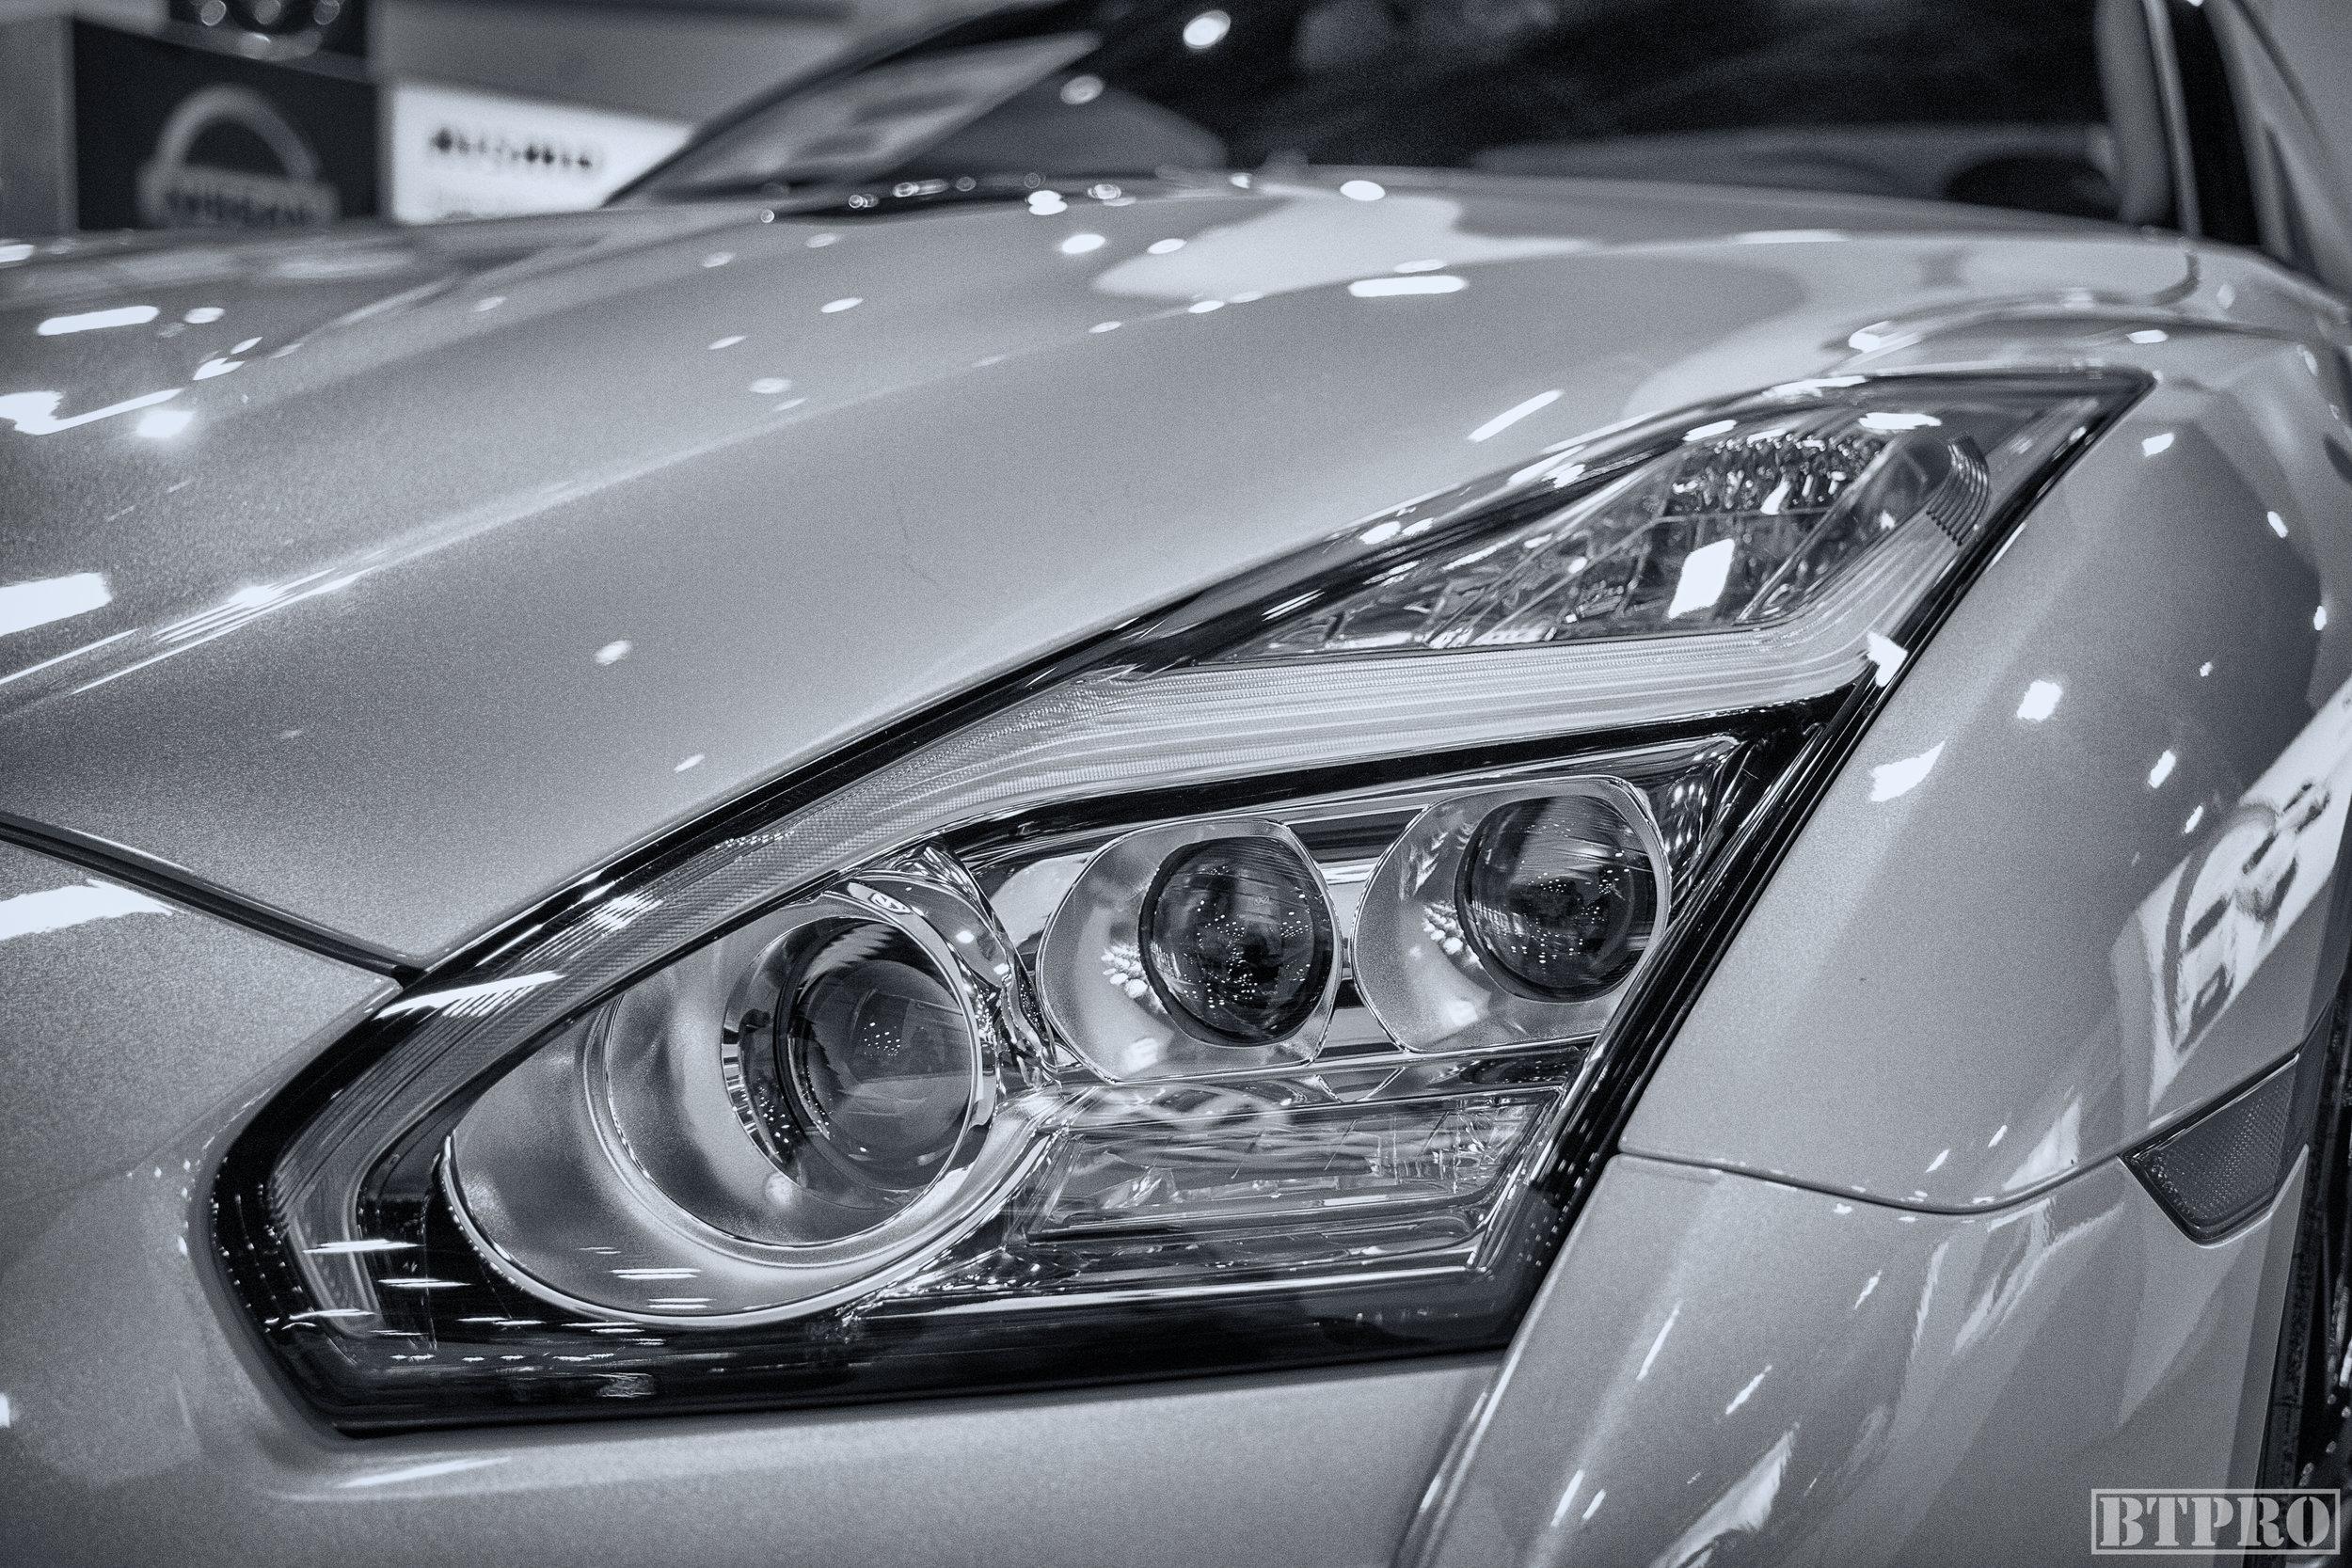 nissan, nissan gtr, gtr,, car show, miami, miami international car show, miami international auto show, auto show, exotic cars, muscle cars, car photography